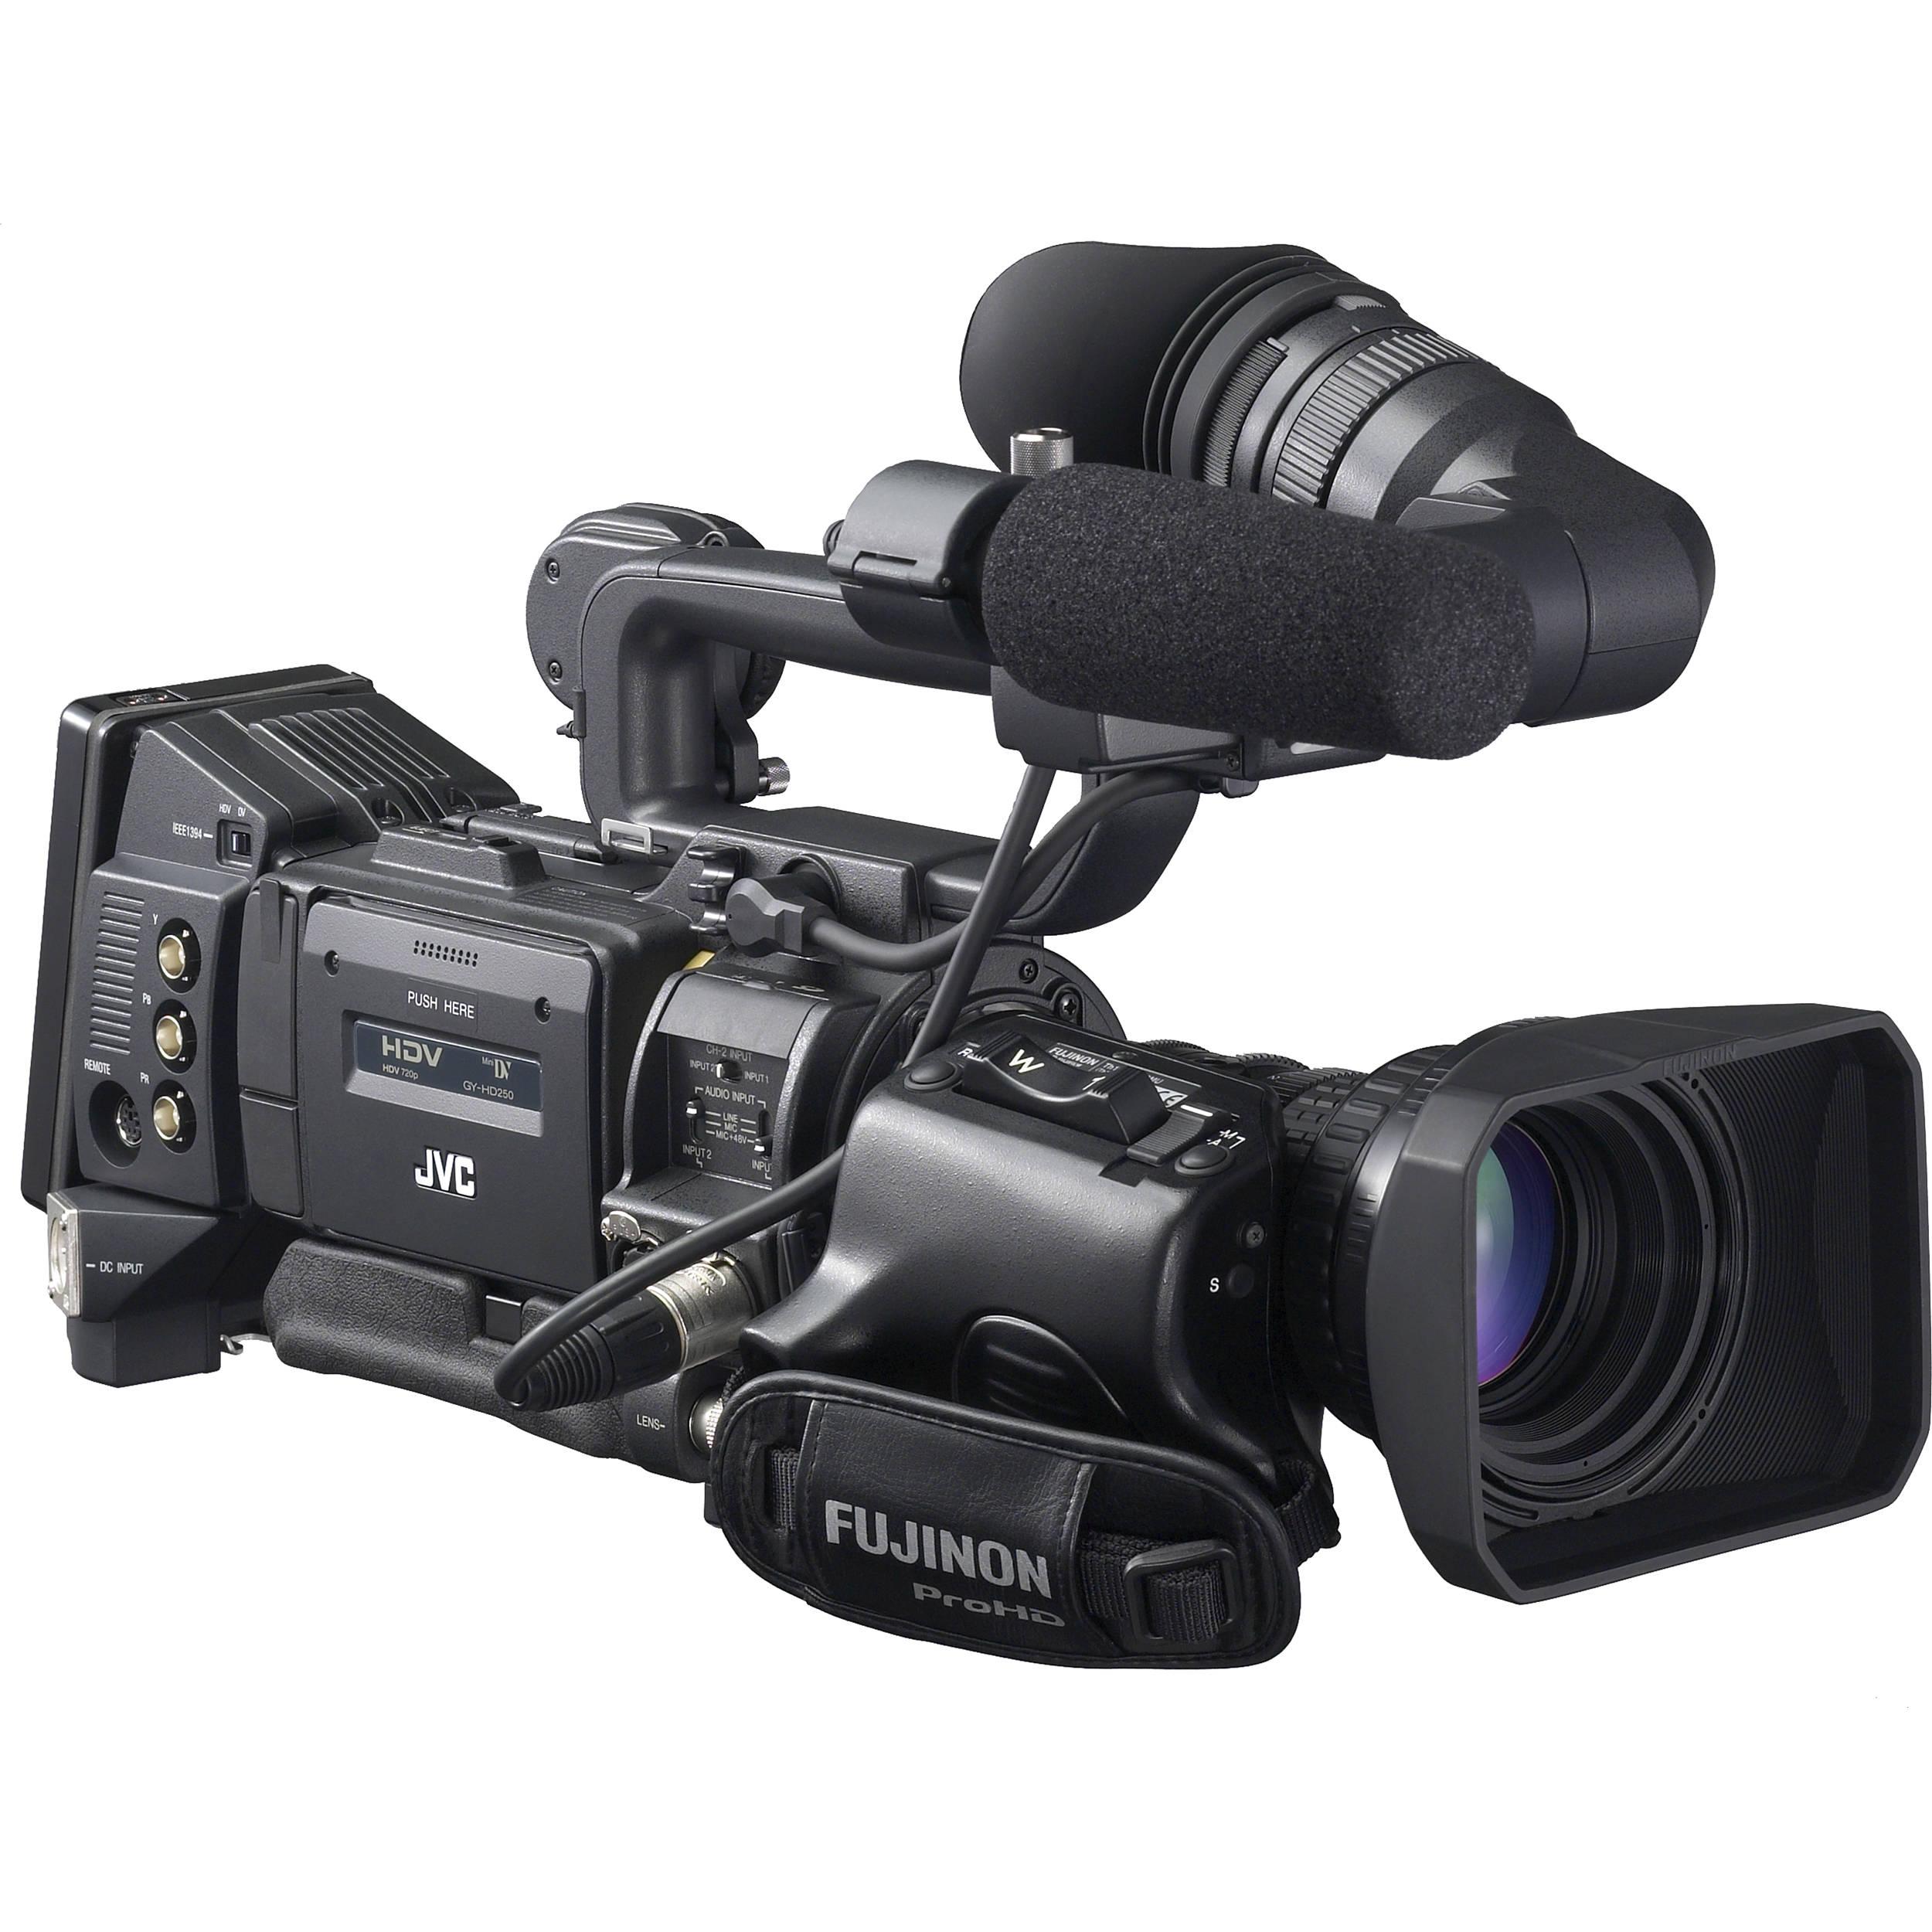 jvc gy hd200ub professional hdv camcorder gy hd200ub b h photo rh bhphotovideo com Broadcast Camera JVC JVC Camcorder DVD